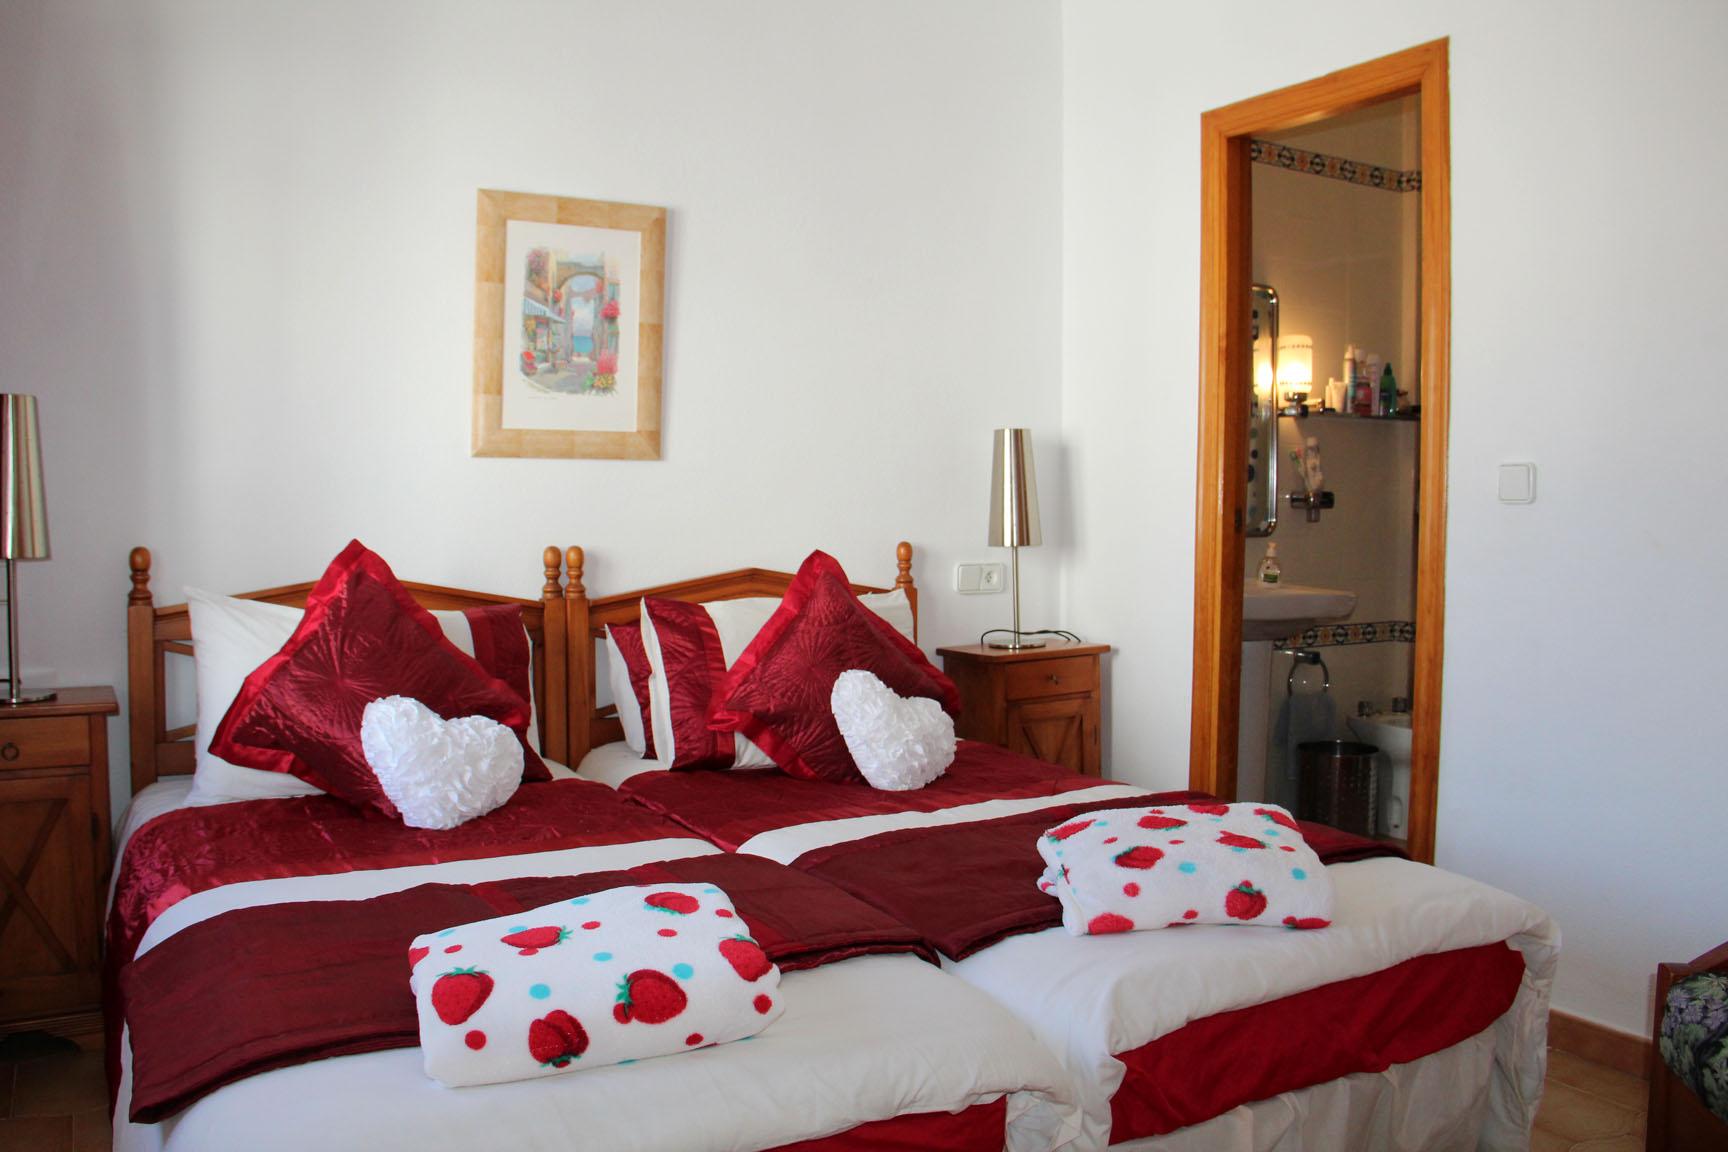 ITSH Property Twin bedroom with ensuite bathroom 9